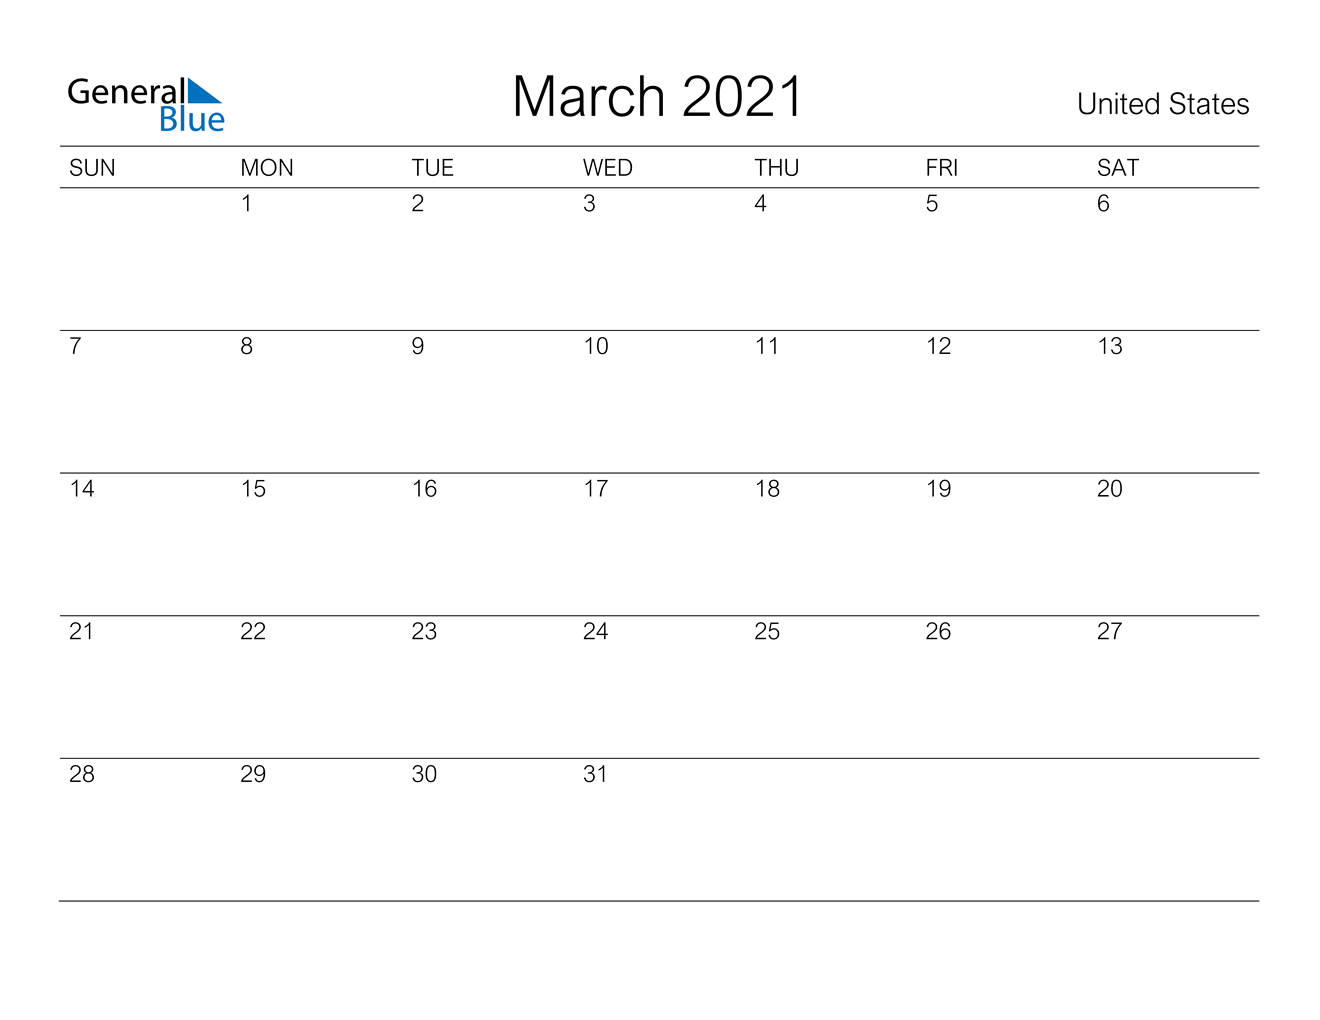 March 2021 Calendar - United States